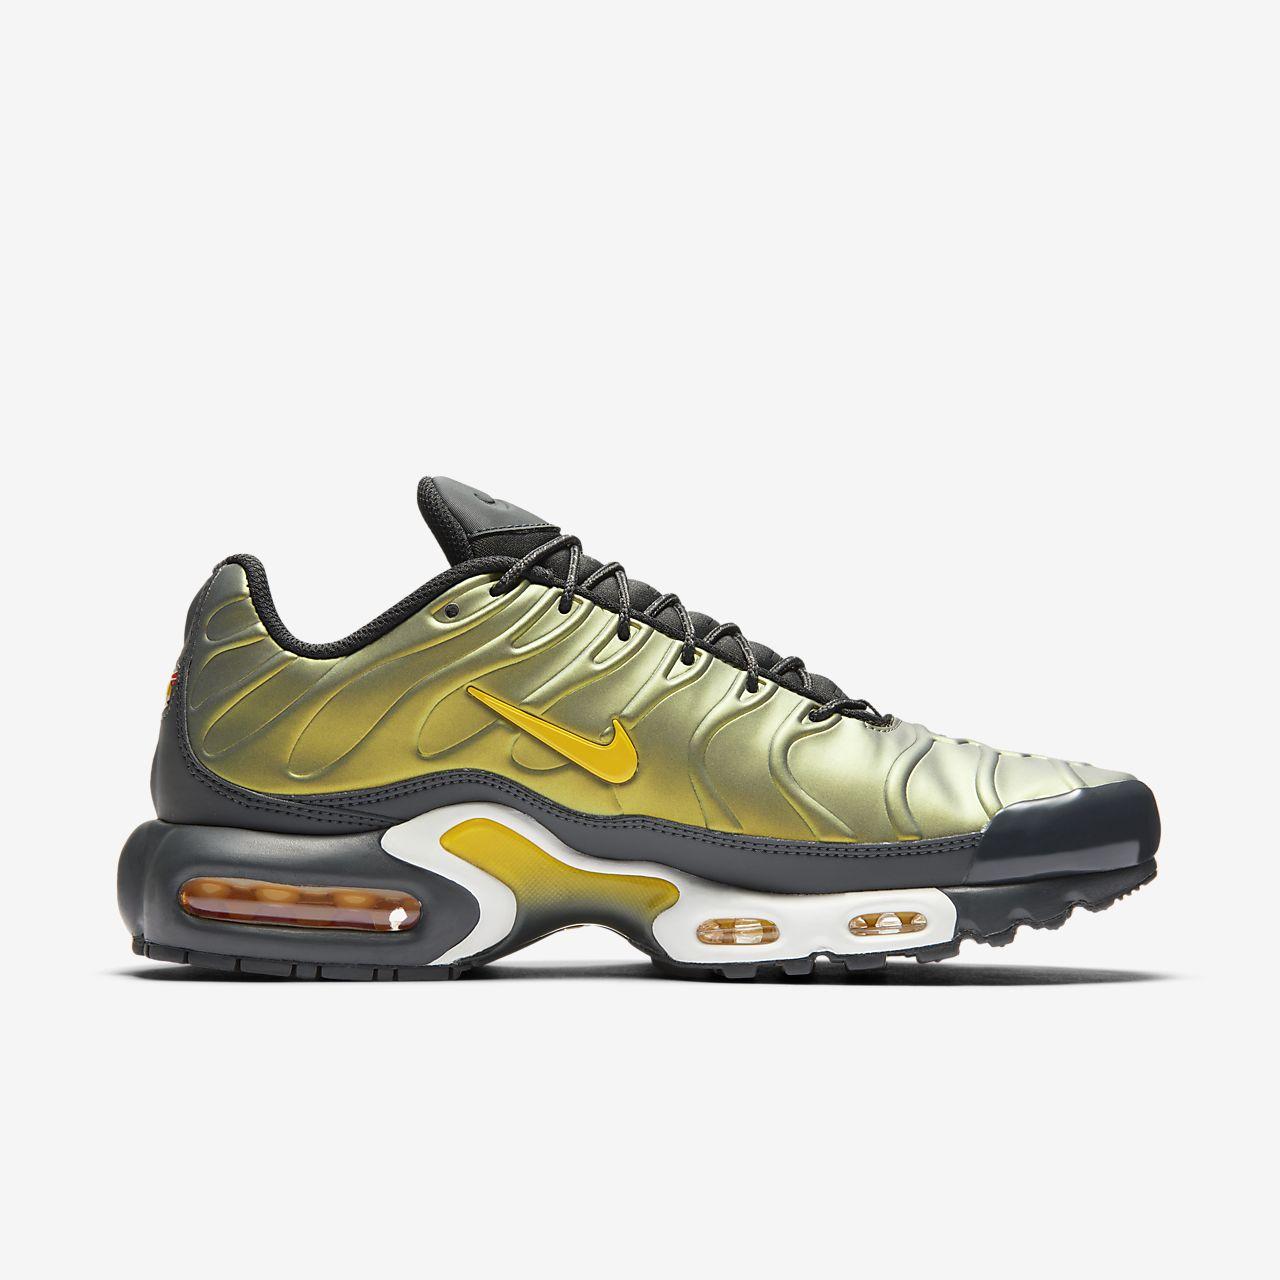 new style e46d6 67ba5 ... Nike Air Max Plus SE Men s Shoe